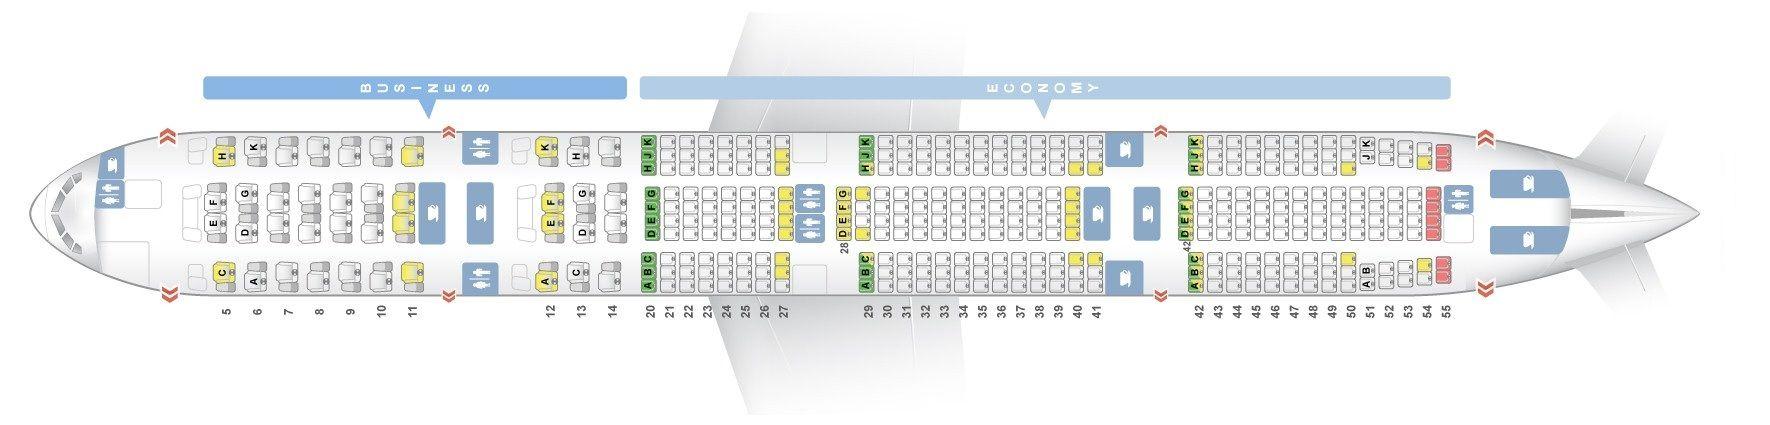 Etihad Airways Fleet Boeing 777 300er Details And Pictures Dengan